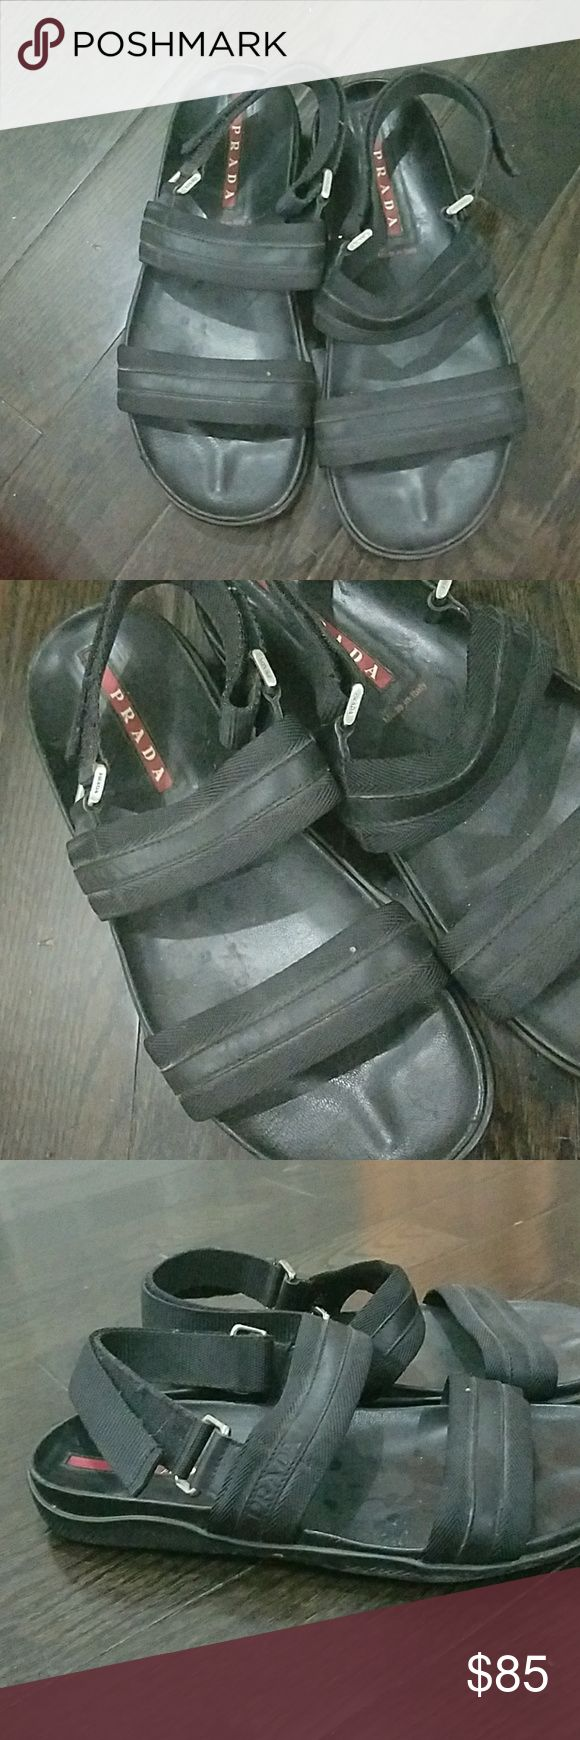 Prada men shoes size 9 US Prada men shoes size 9 US used Prada Shoes